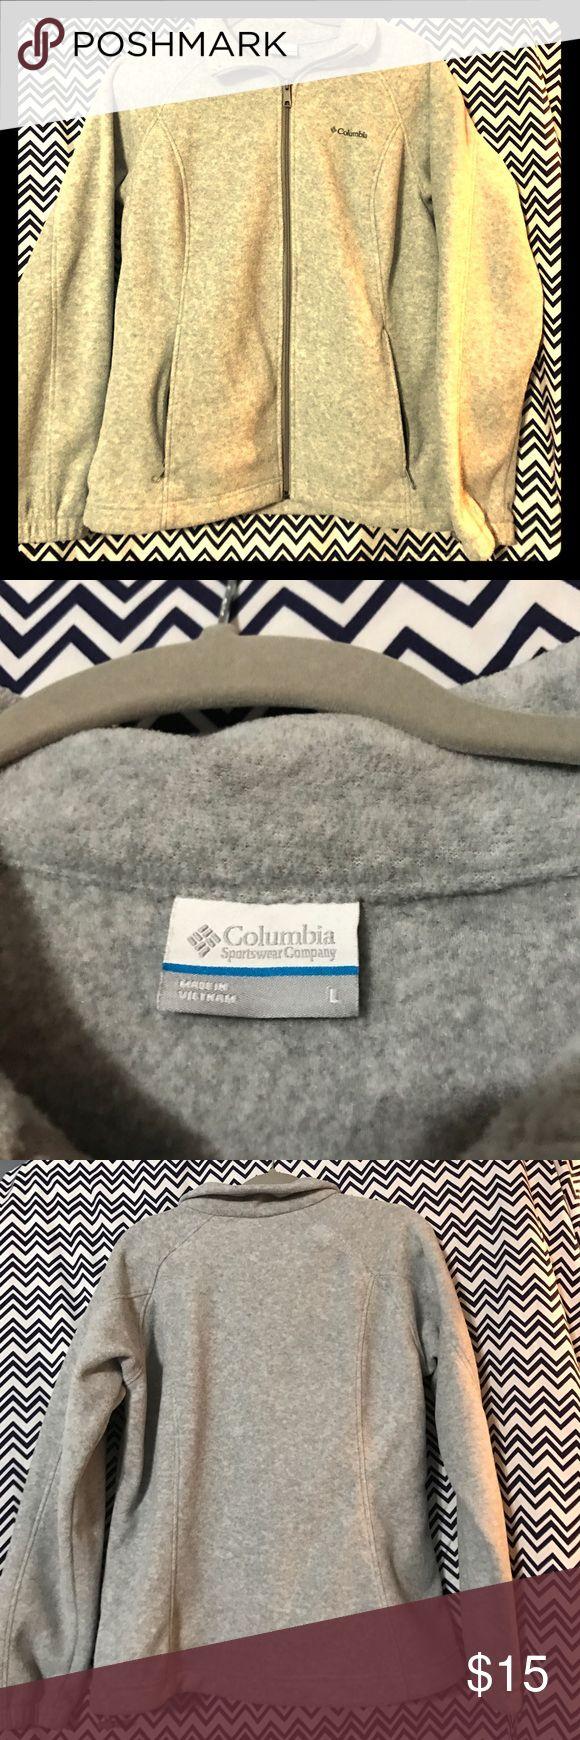 Gray Columbia fleece size L Cute gray Columbia zip front fleece size L Columbia Jackets & Coats